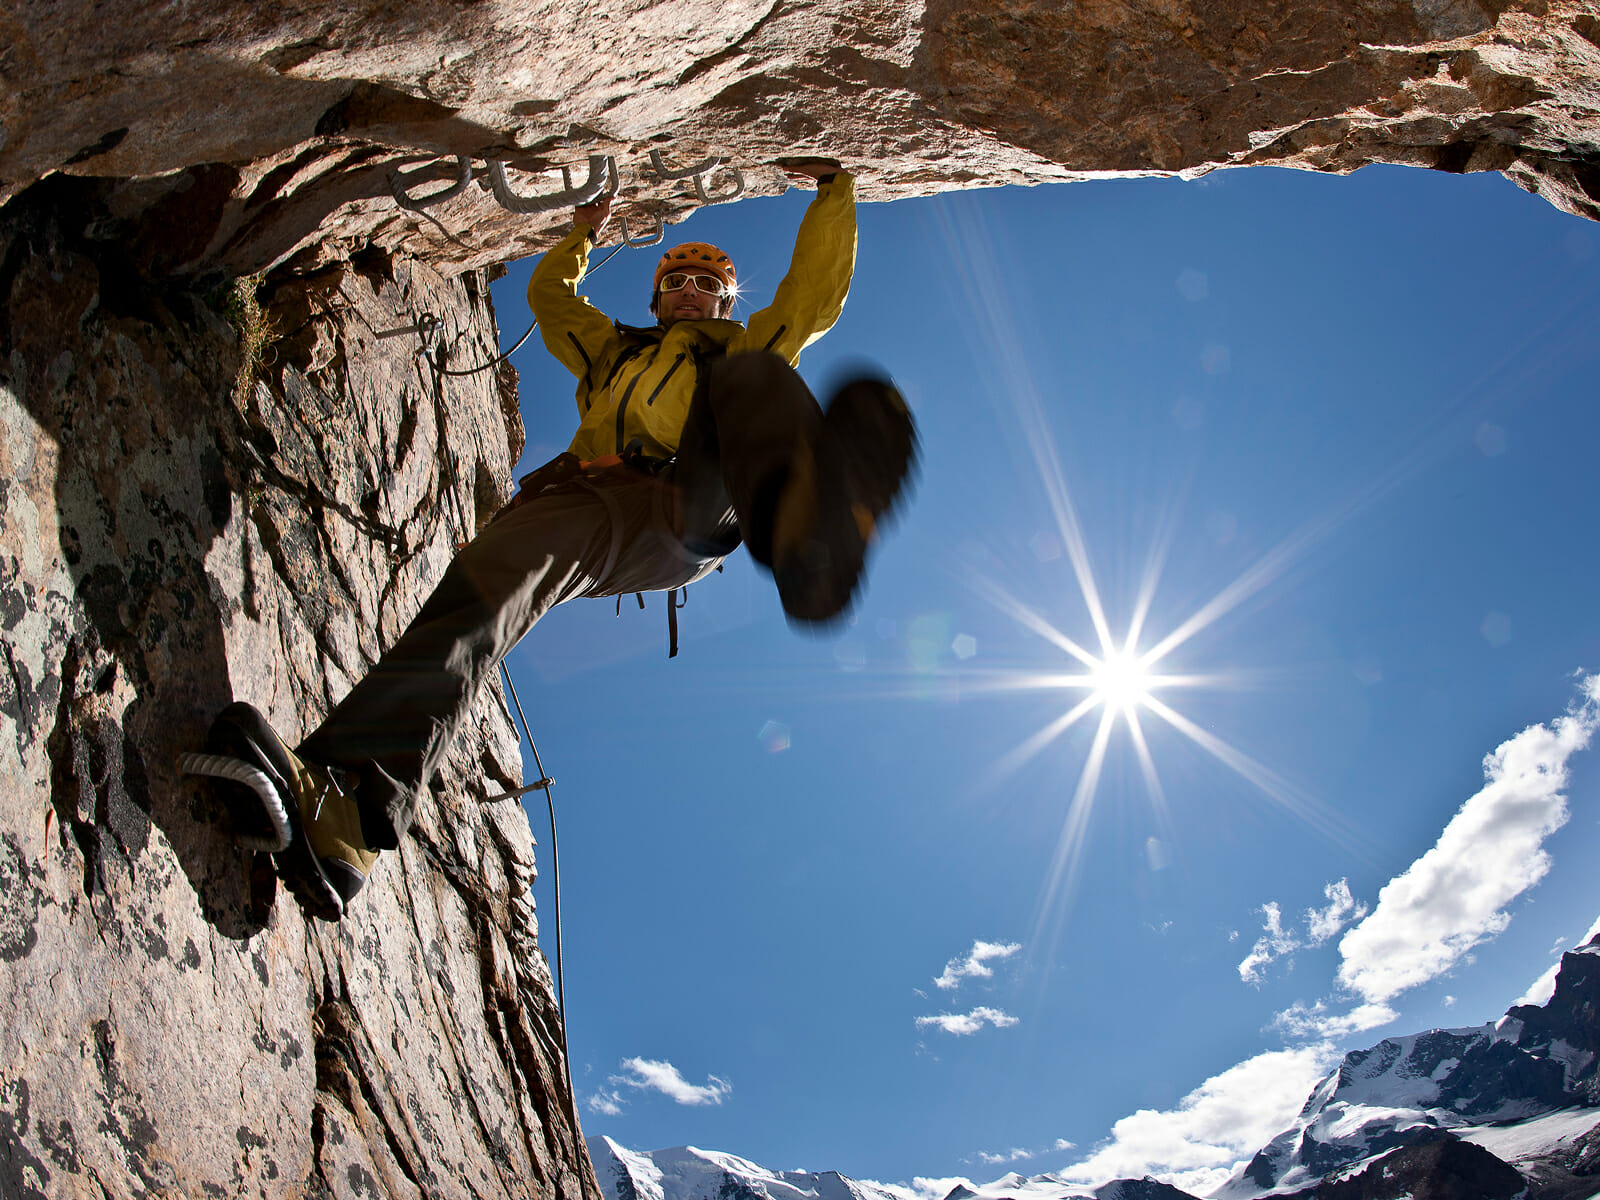 Klettersteig Piz Trovat : Klettersteig piz trovat ii bergsteigerschule pontresina